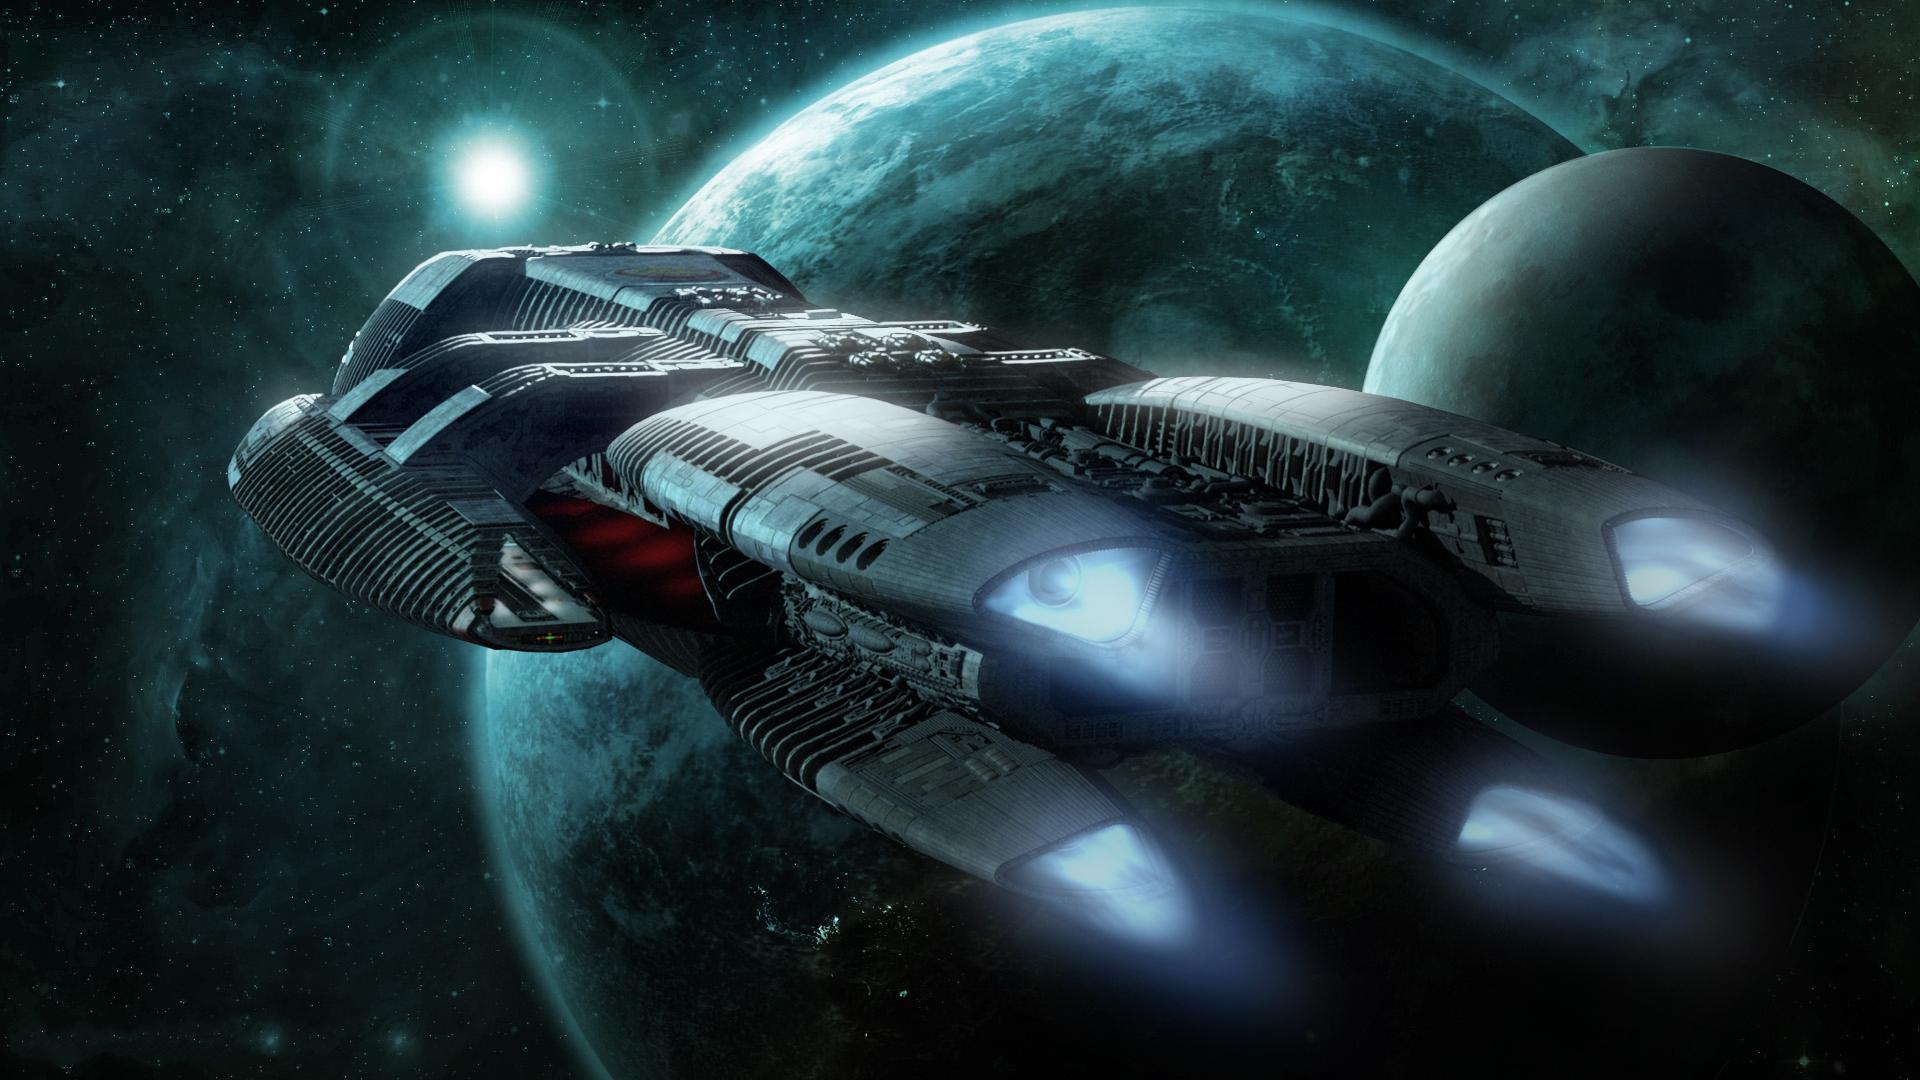 Battlestar Galactica Wallpaper Android - Zendha